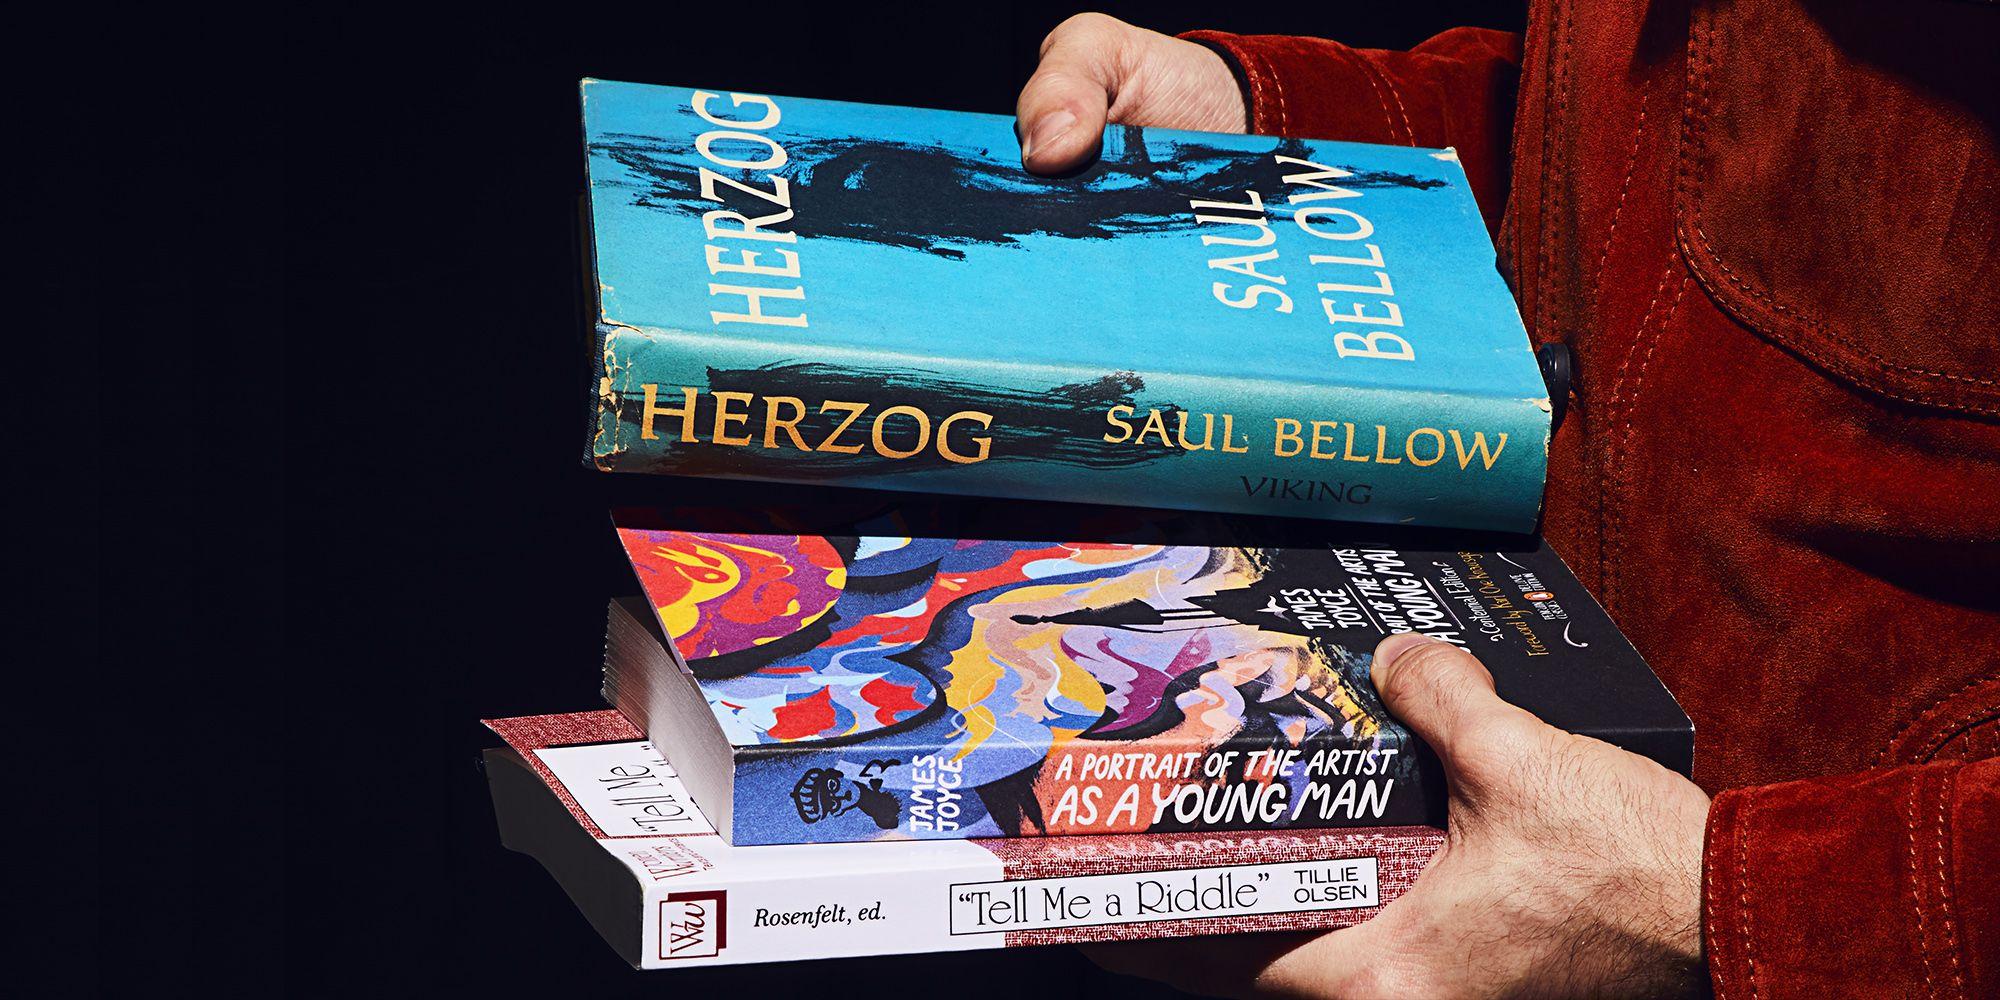 Scott Turow: 3 Books That Changed My Life